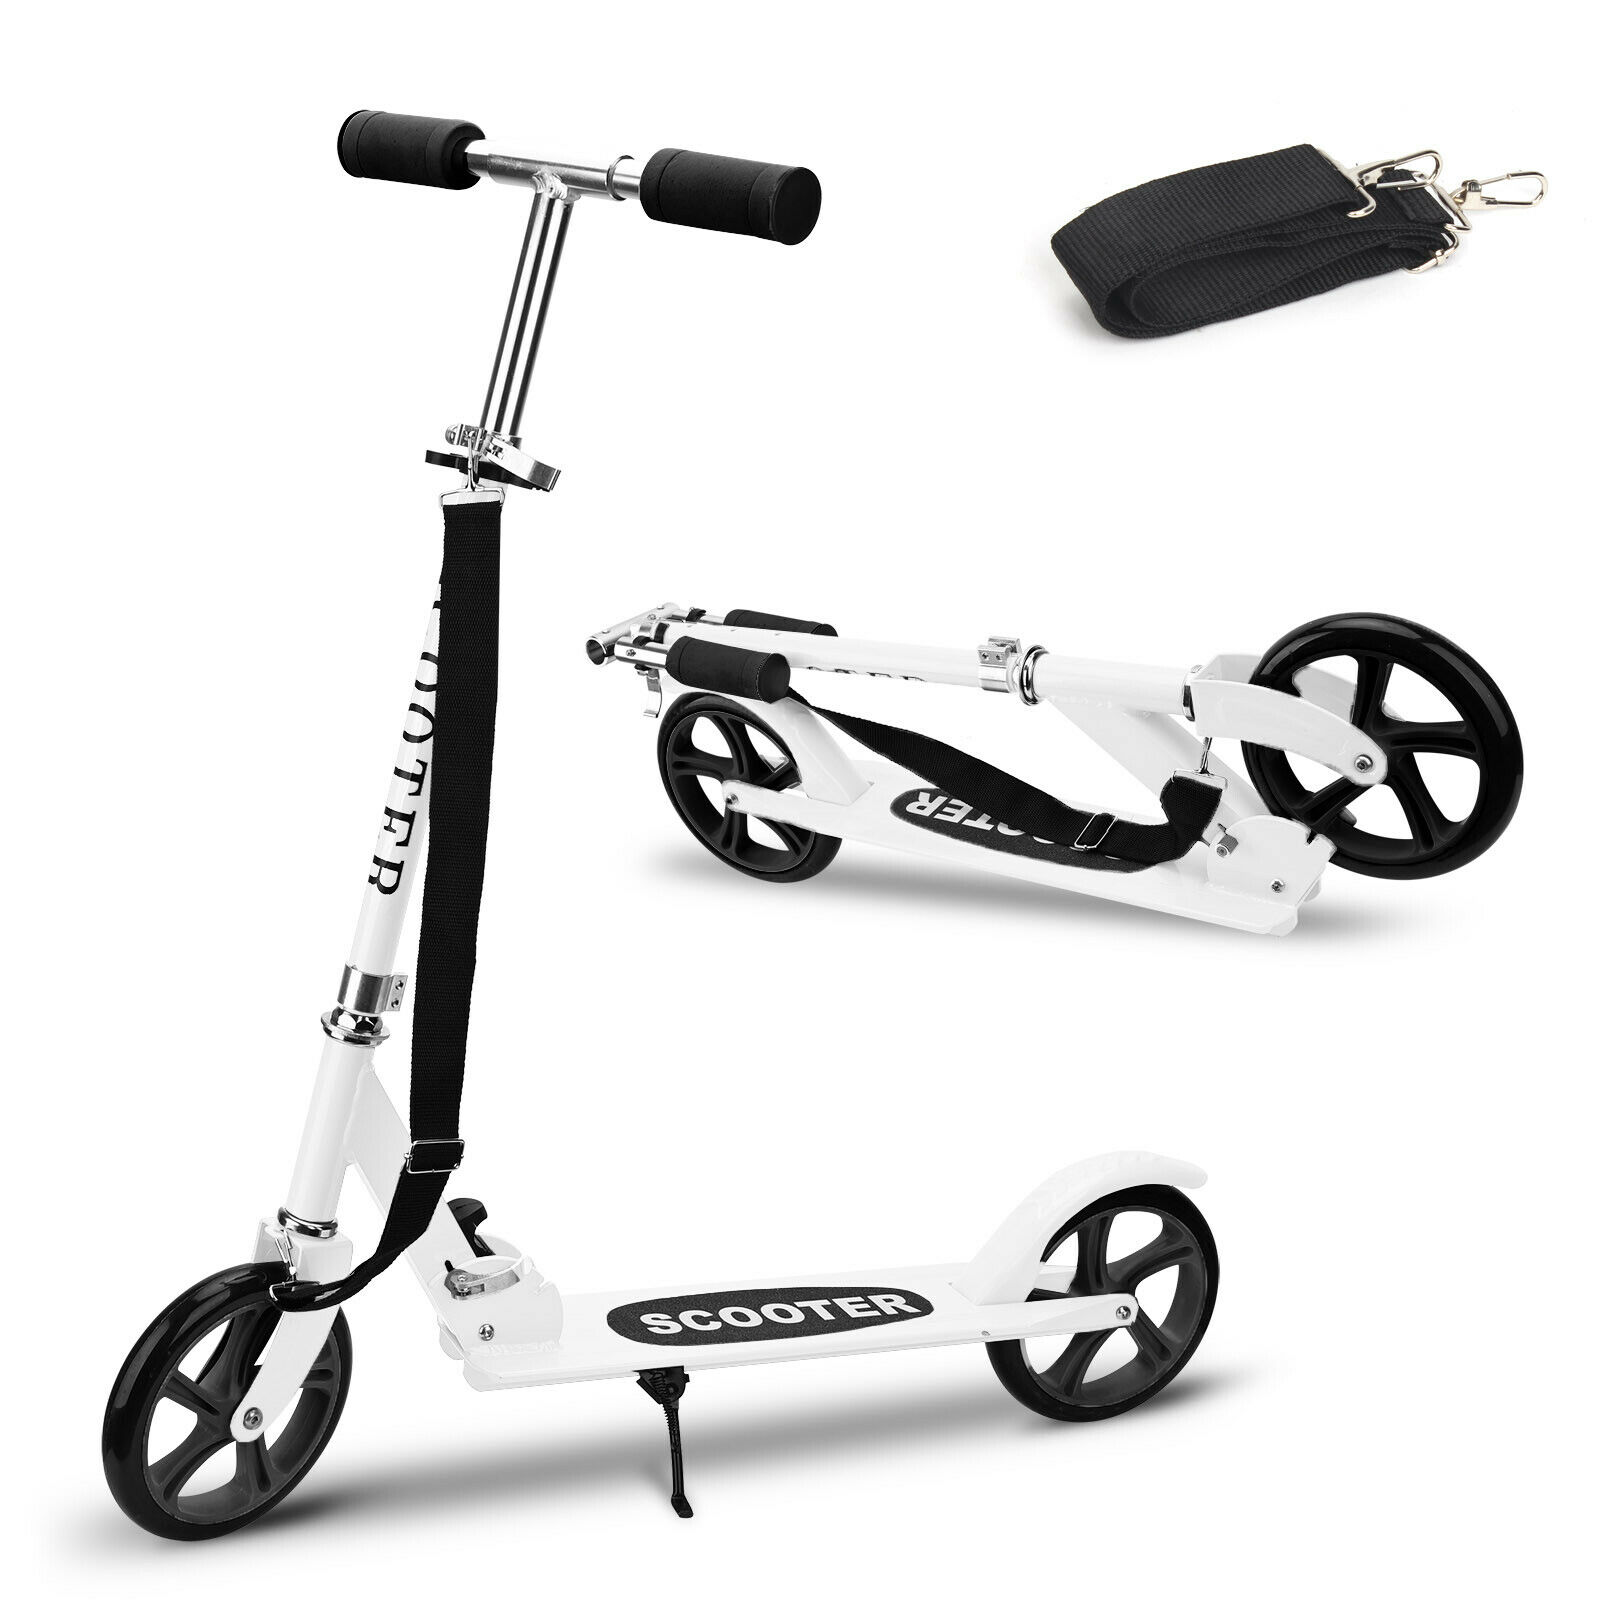 Adult Kick Scooter Folding 2 Wheels Ride Portable Lightweigh